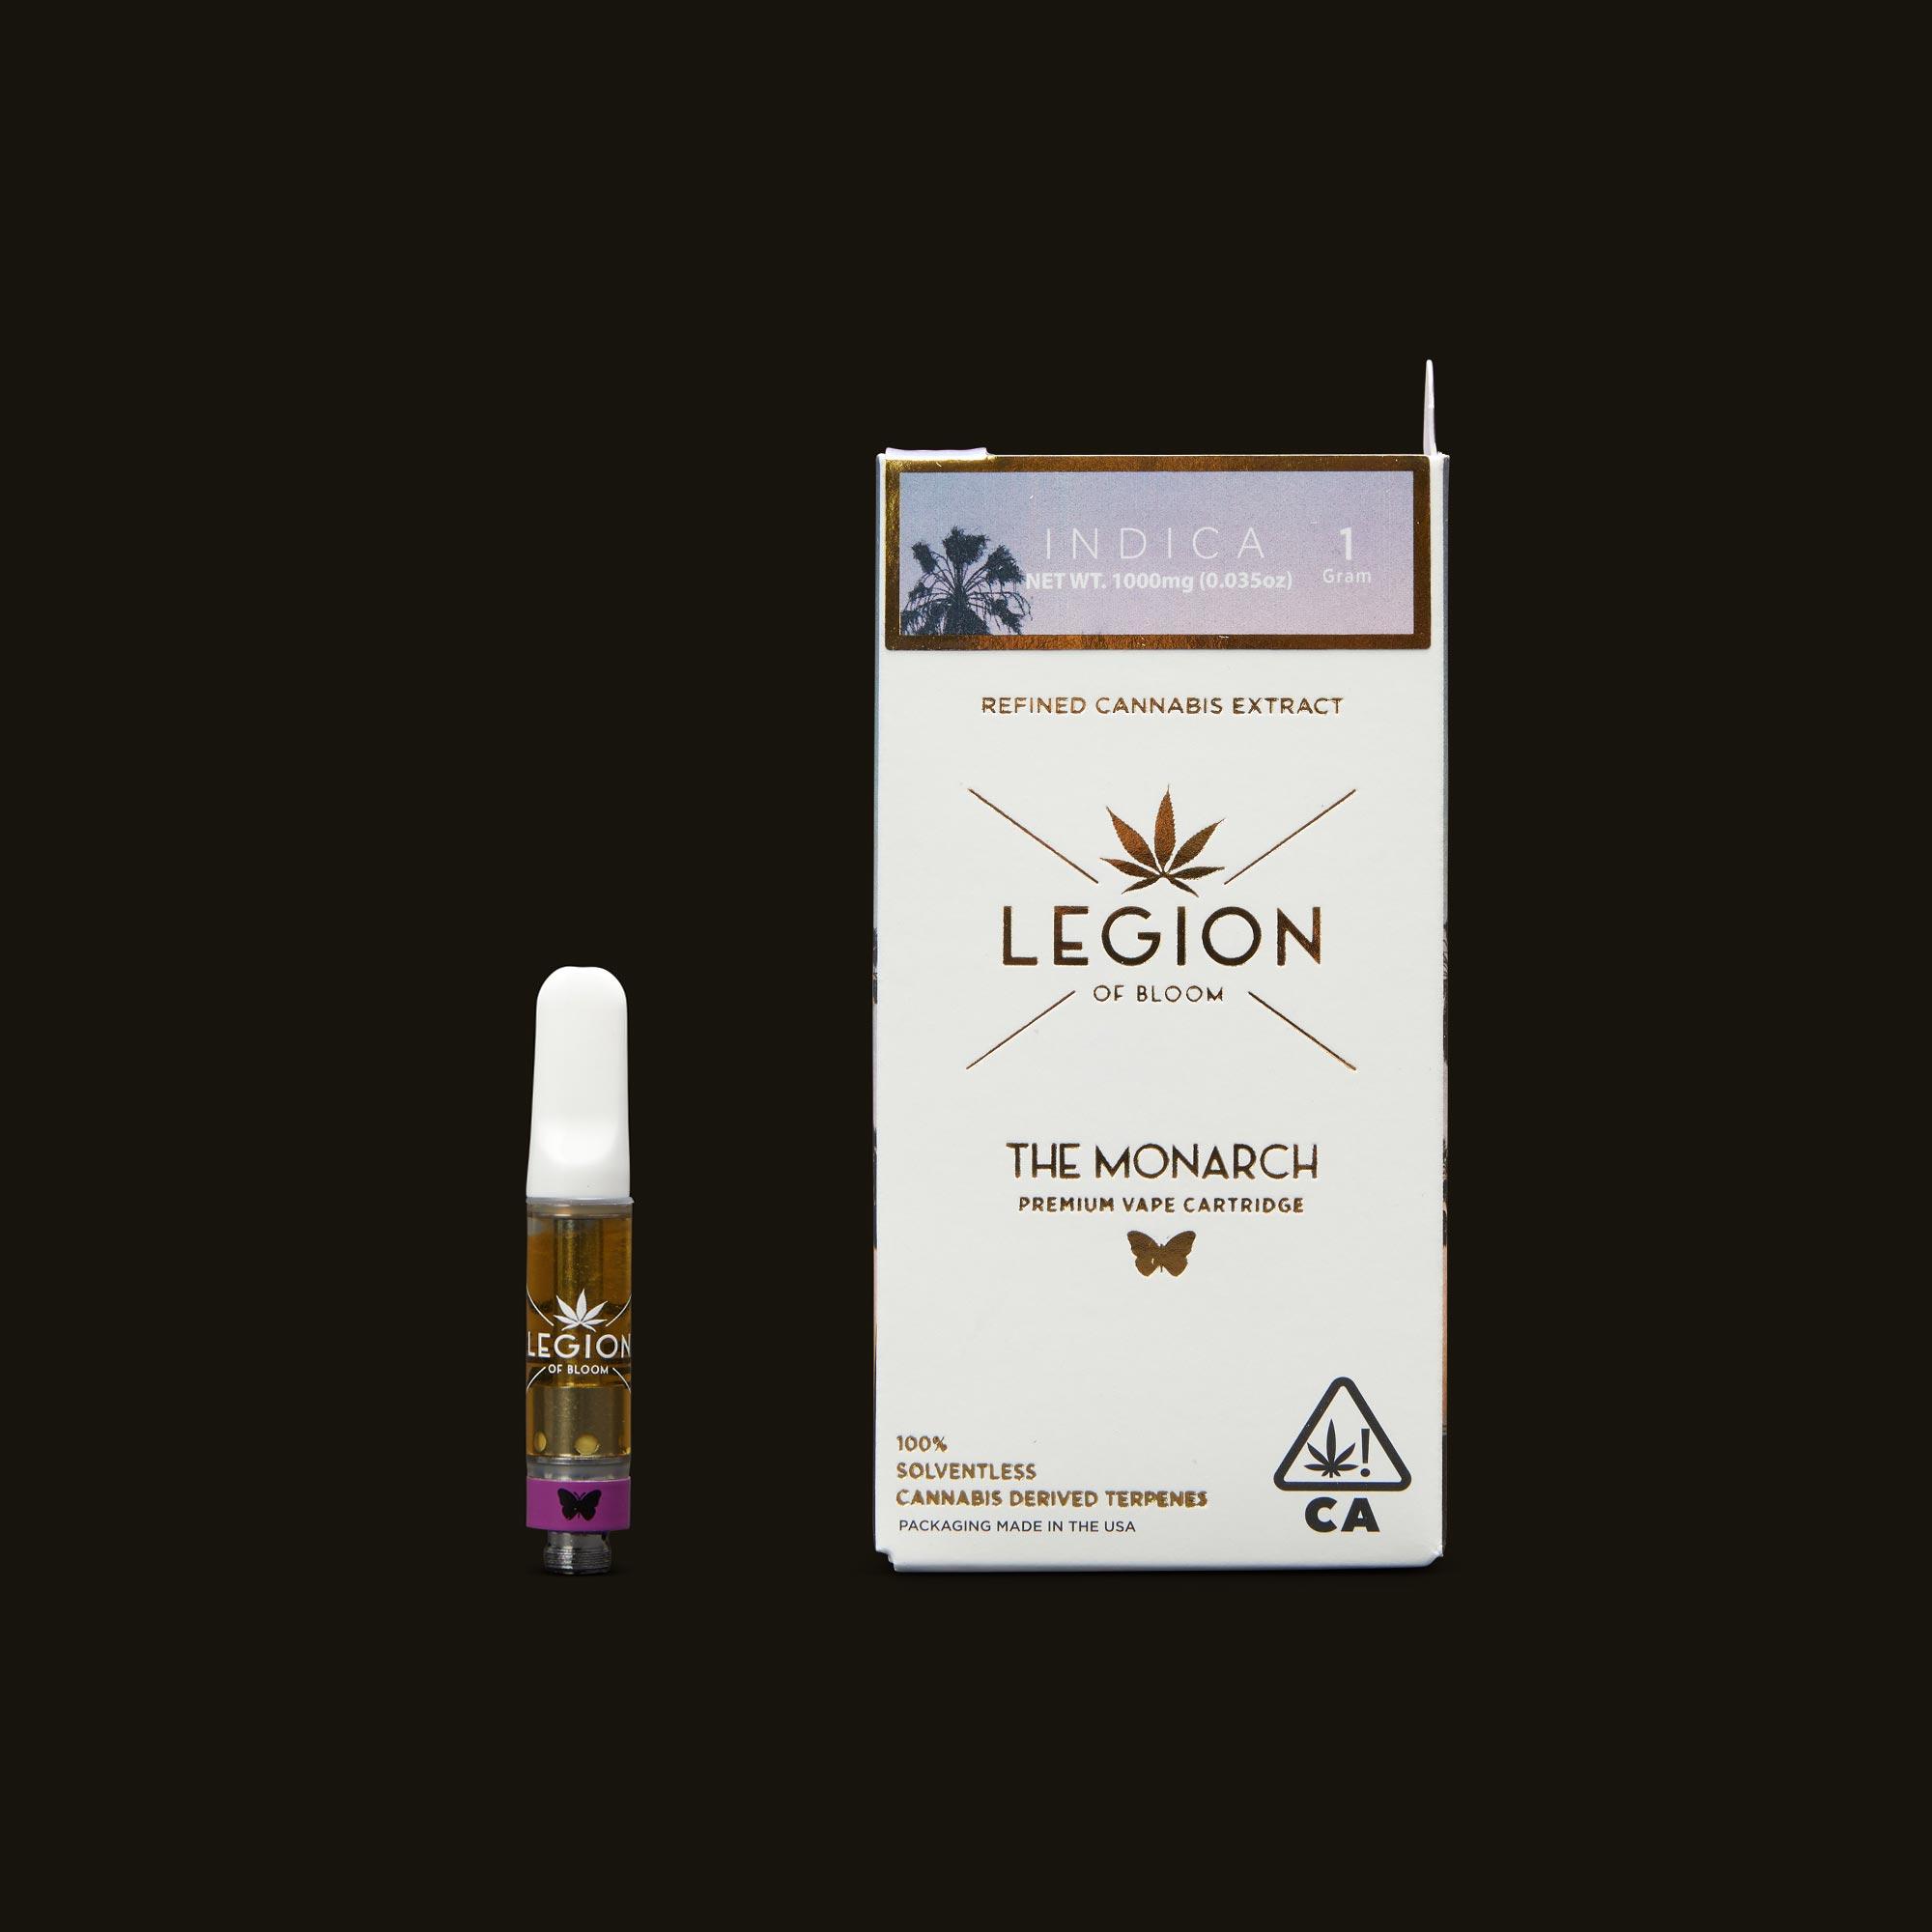 Legion of Bloom Ice Cream Cake Monarch 1g